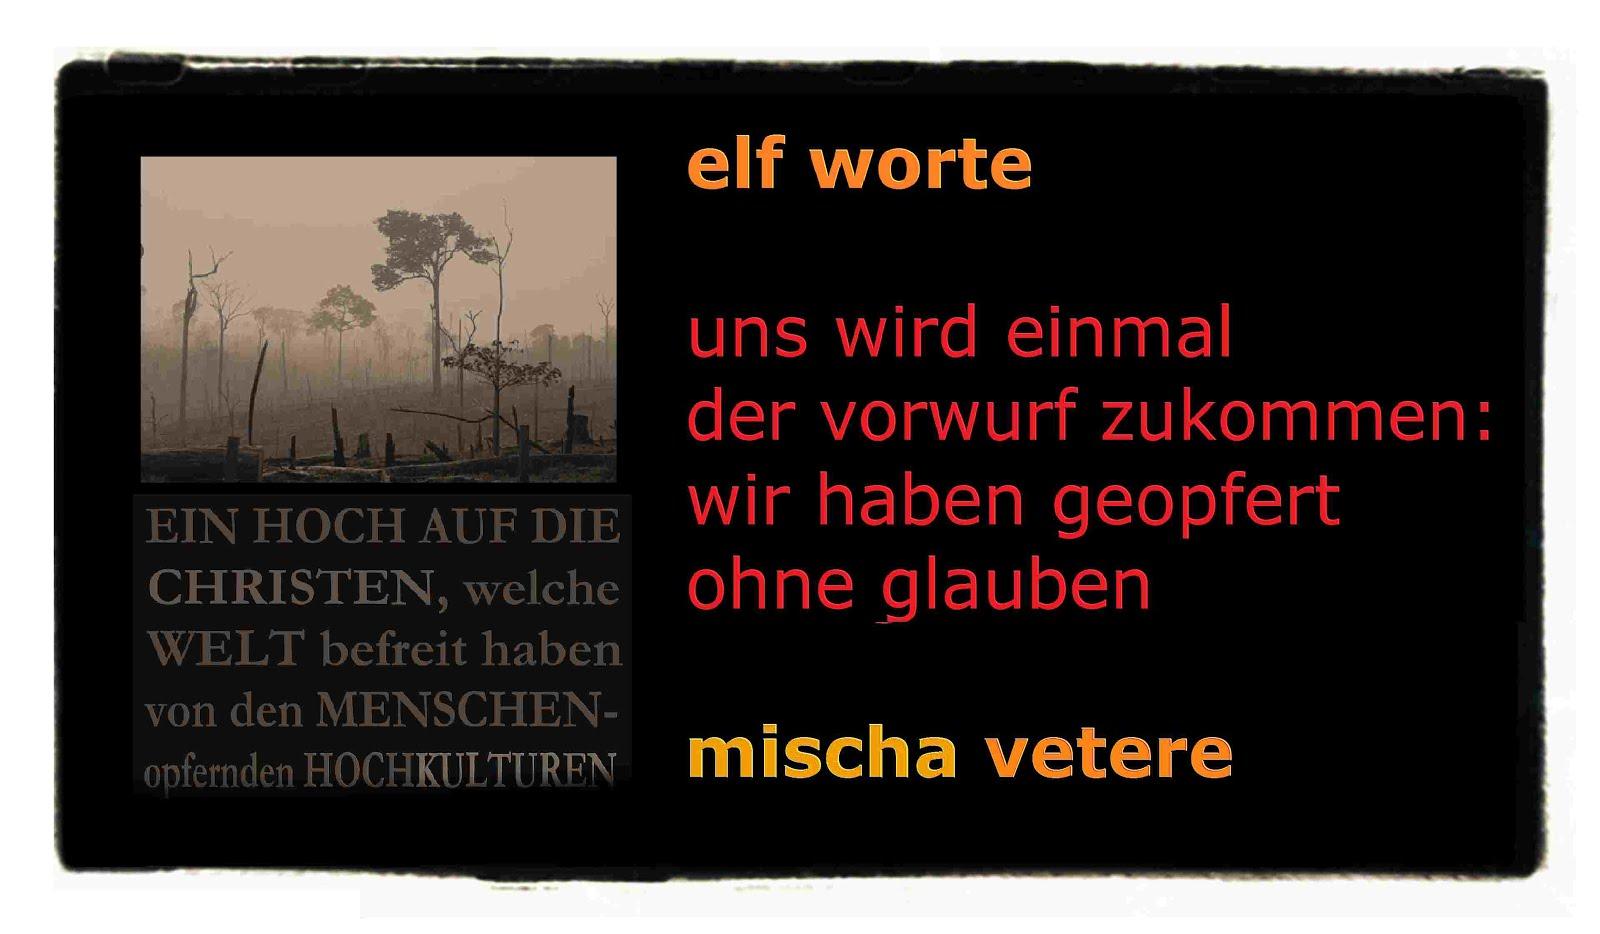 rainforest THE MENTAL REVOLUTION mischa vetere onze mots poème elf worte GEDICHT regenwald